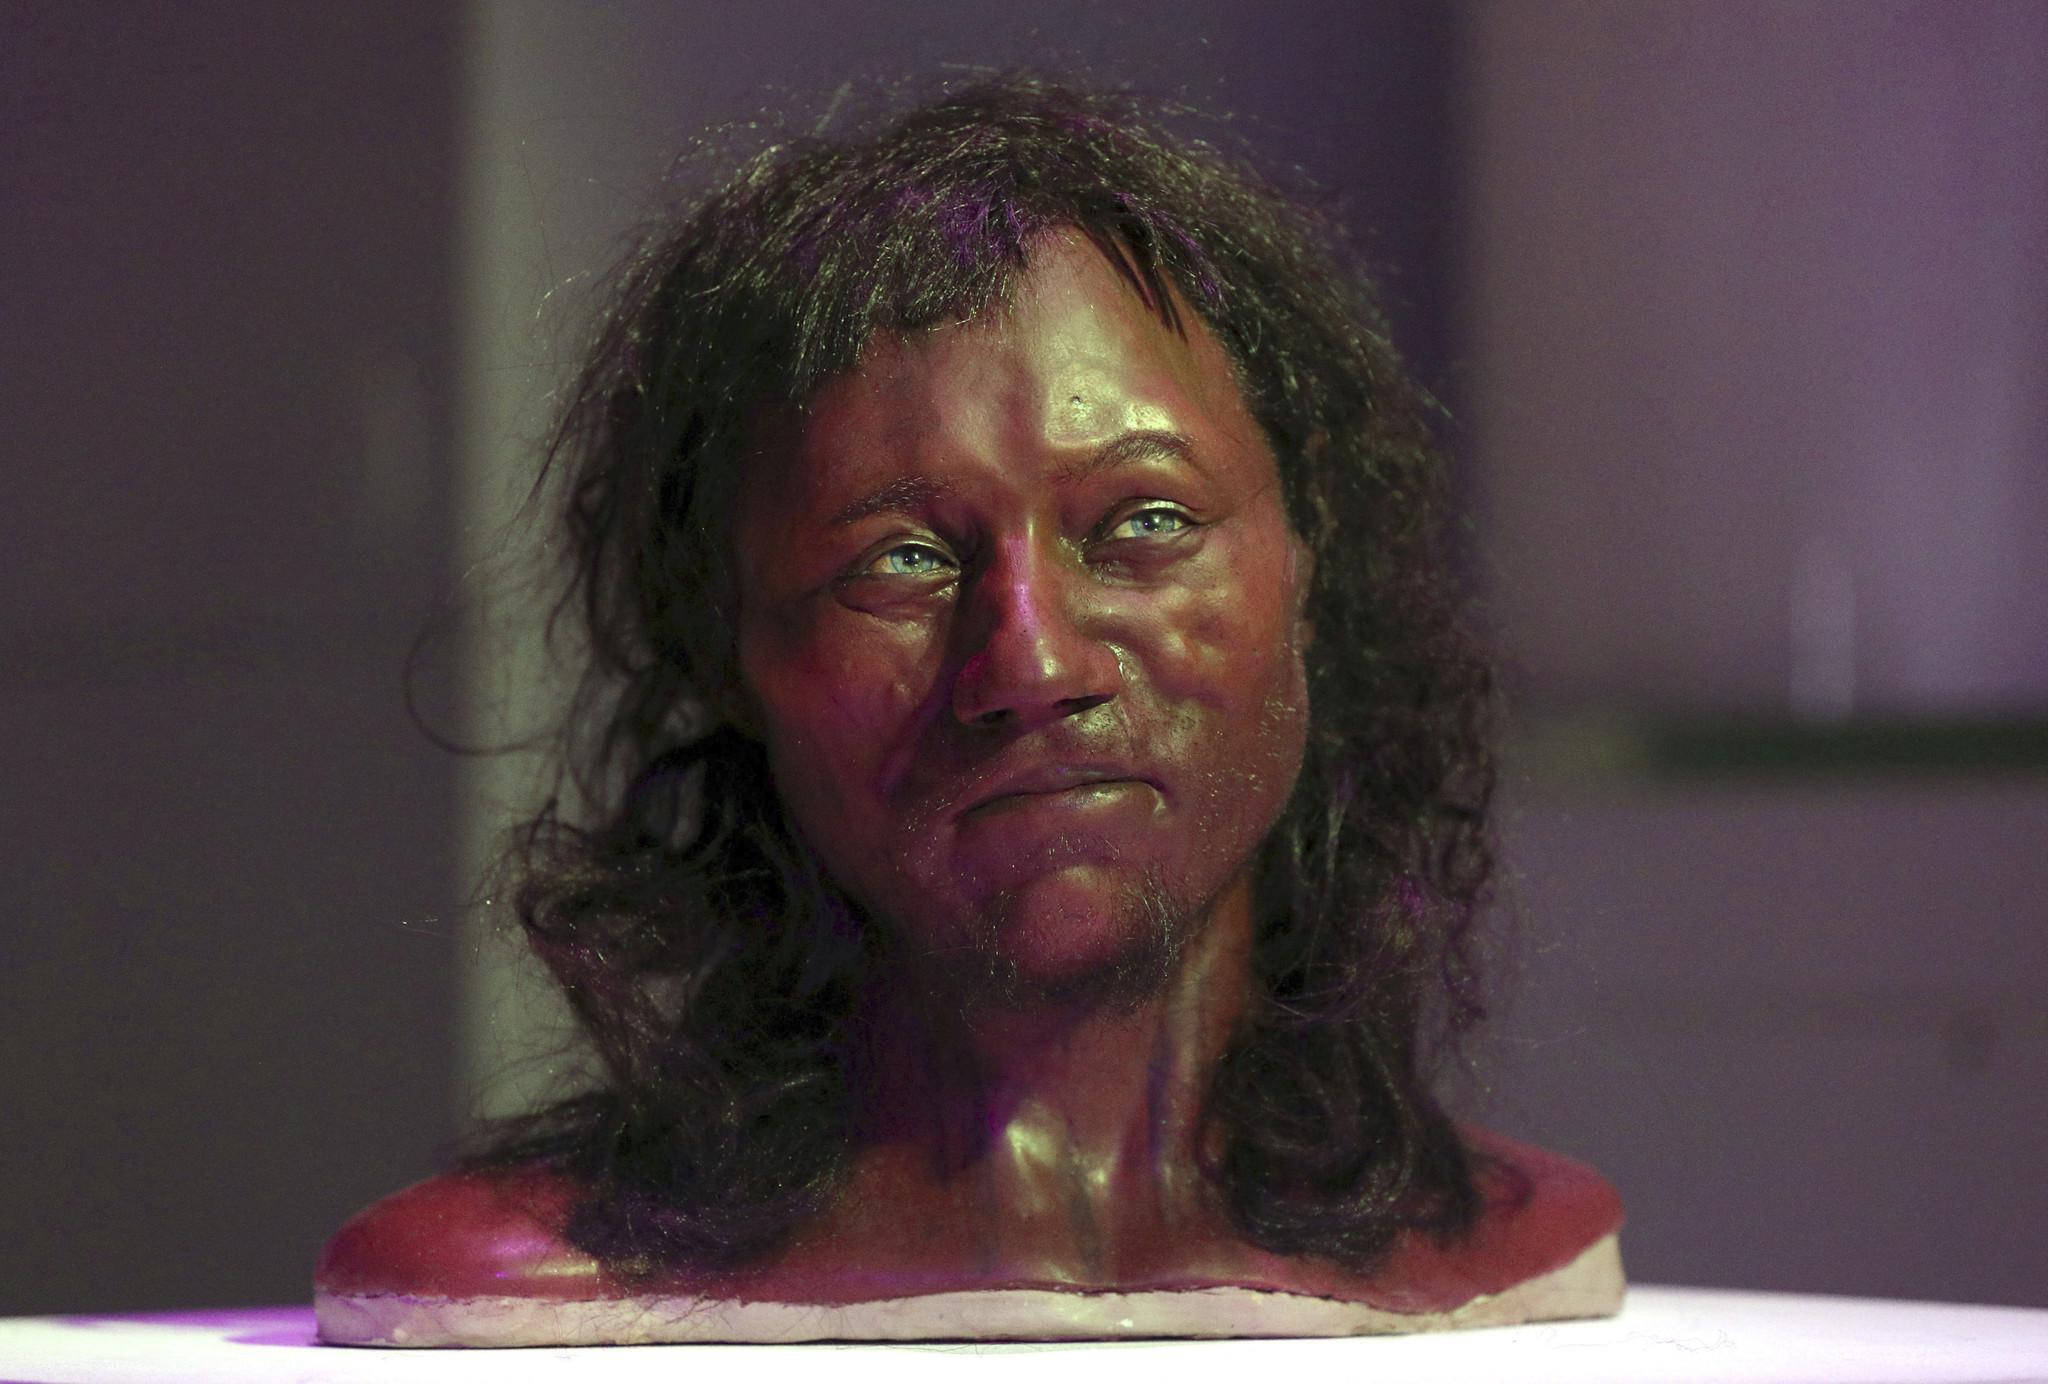 DNA from 10,000-year-old skeleton suggests oldest-known Briton had dark  skin, blue eyes - Chicago Tribune